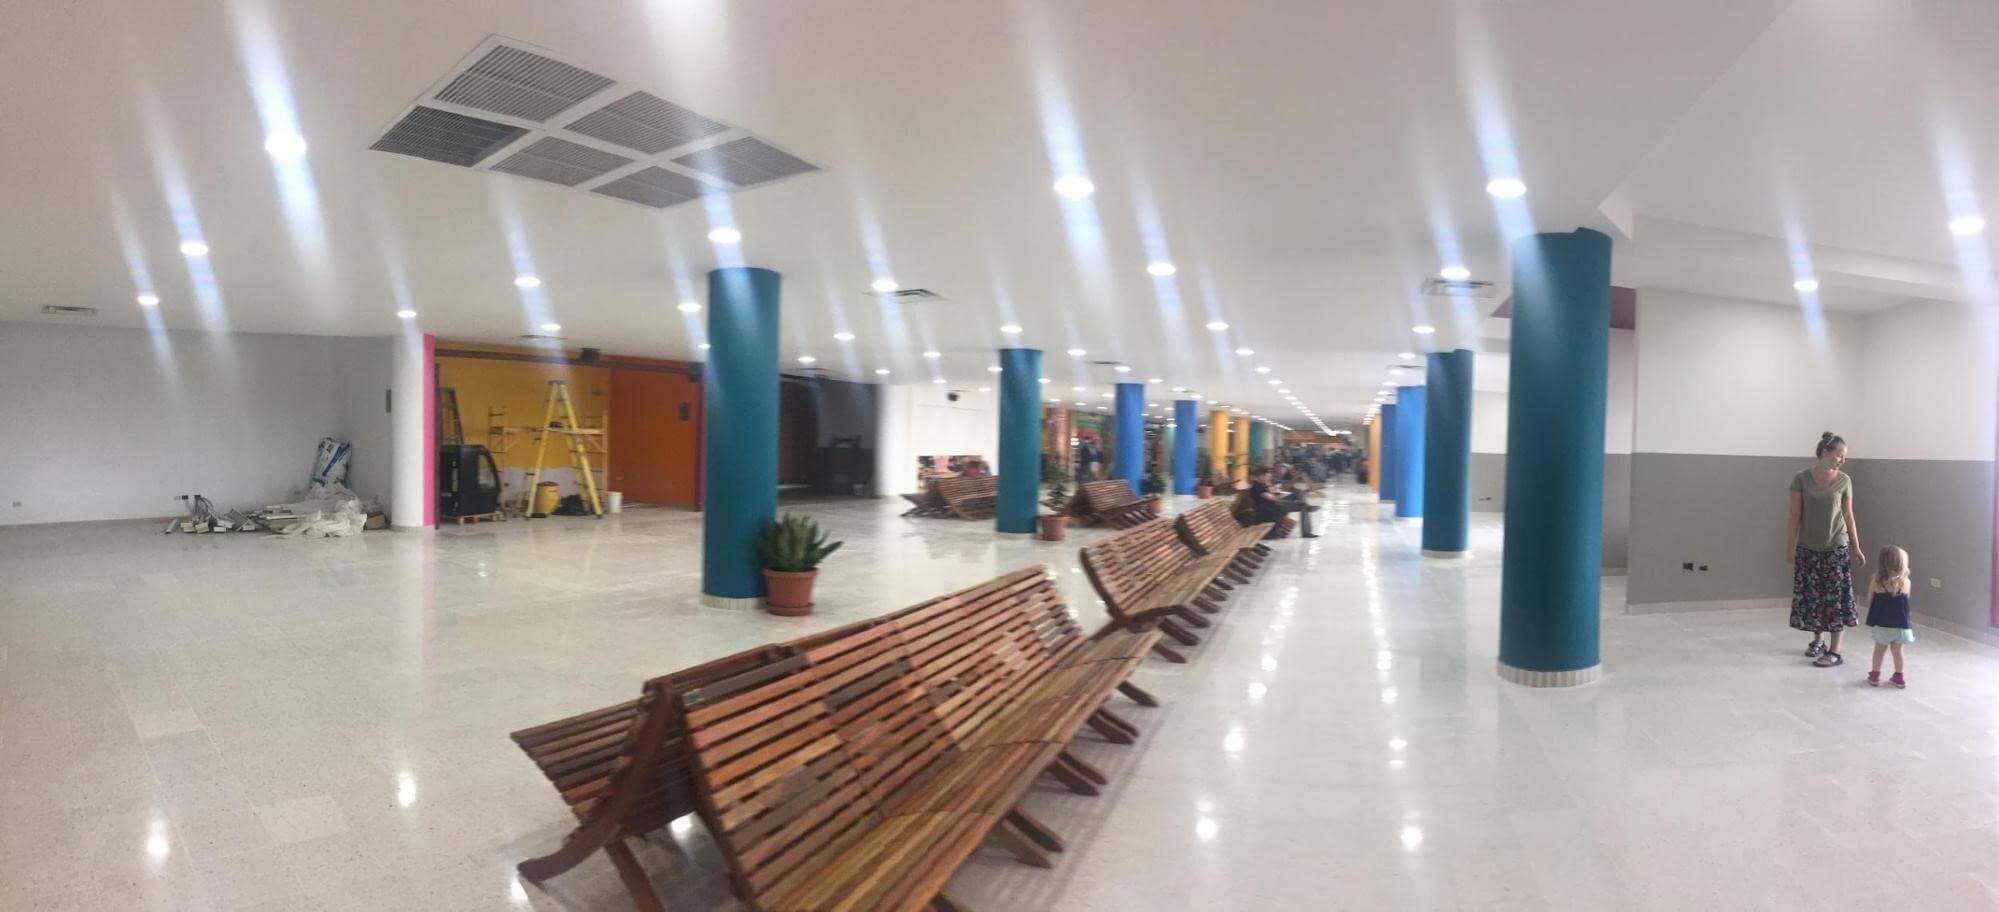 Belize Airport 2.5